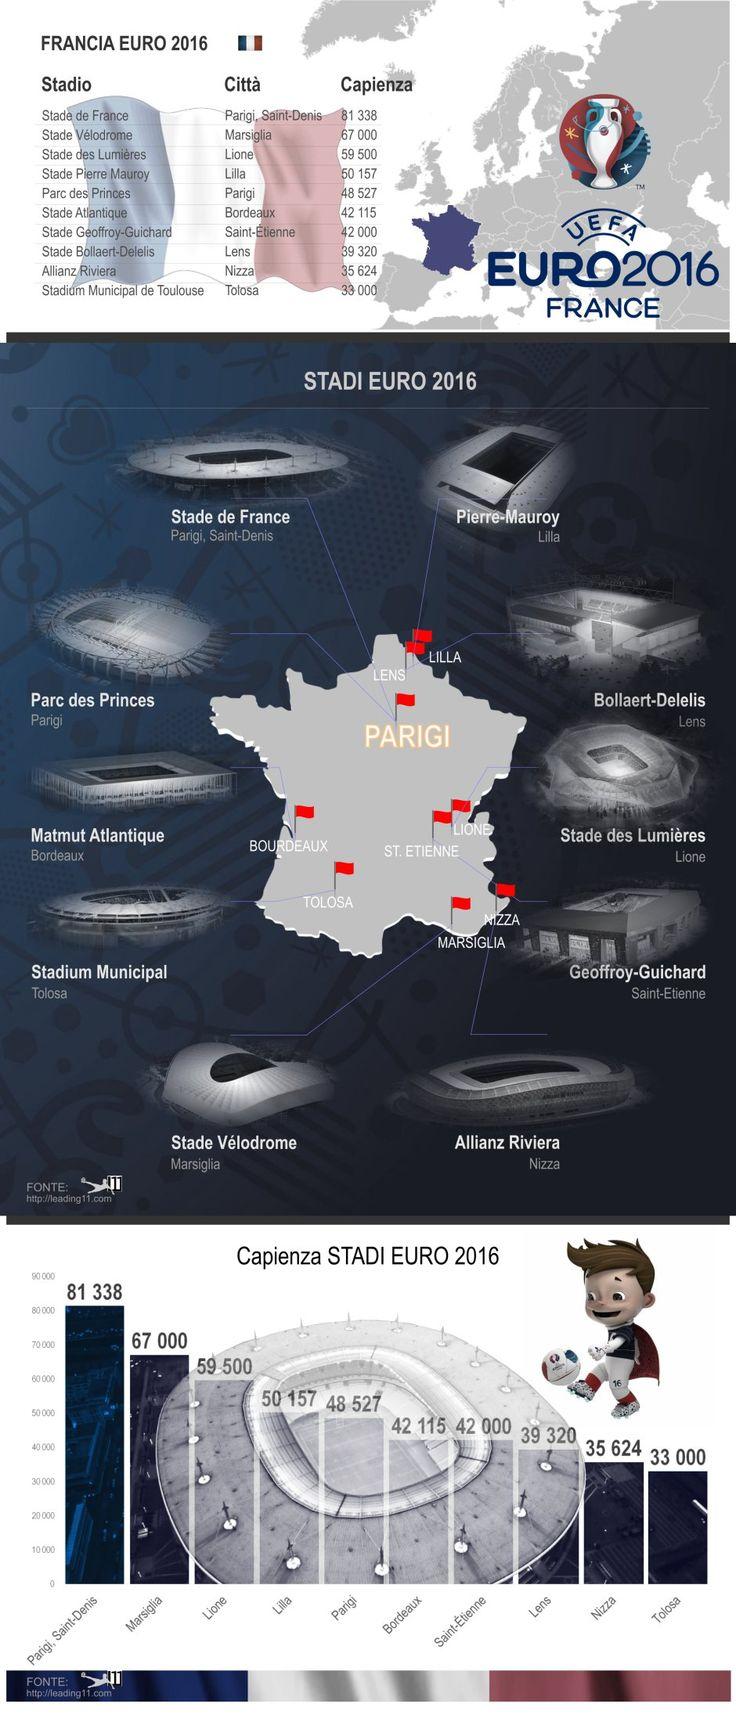 Euro 2016, Francia, Stadi France, Stadiums Euro 2016, Capacity, Capienza, Parc des Princes, Stade de France, Stade des Lumières, calcio, football, statistiche, sport, soccer, Fußball, fútbol